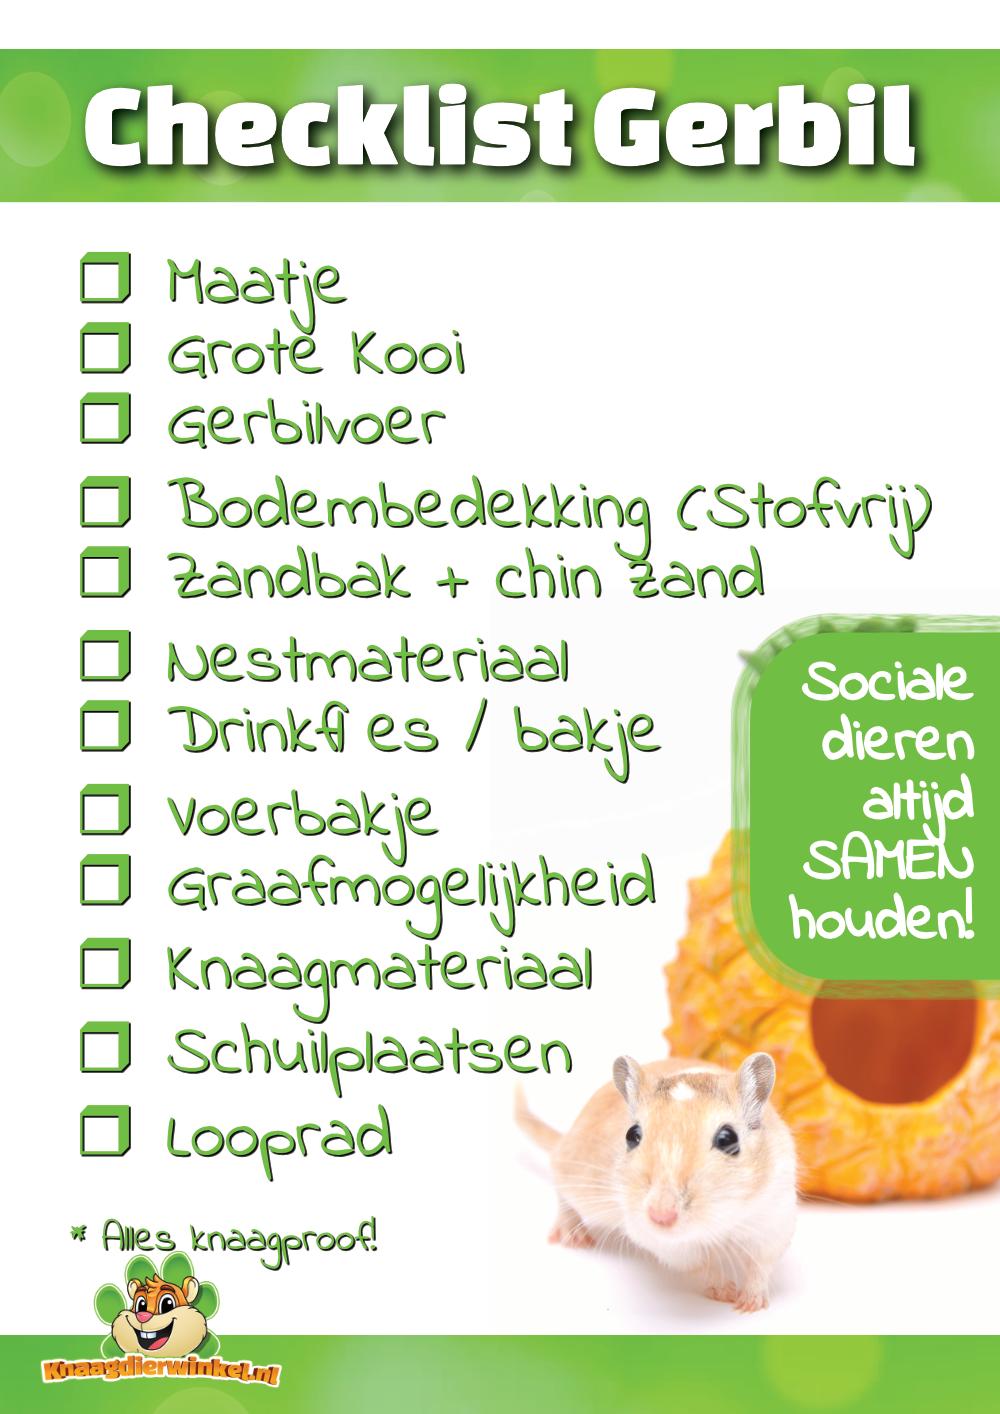 gerbil checklist